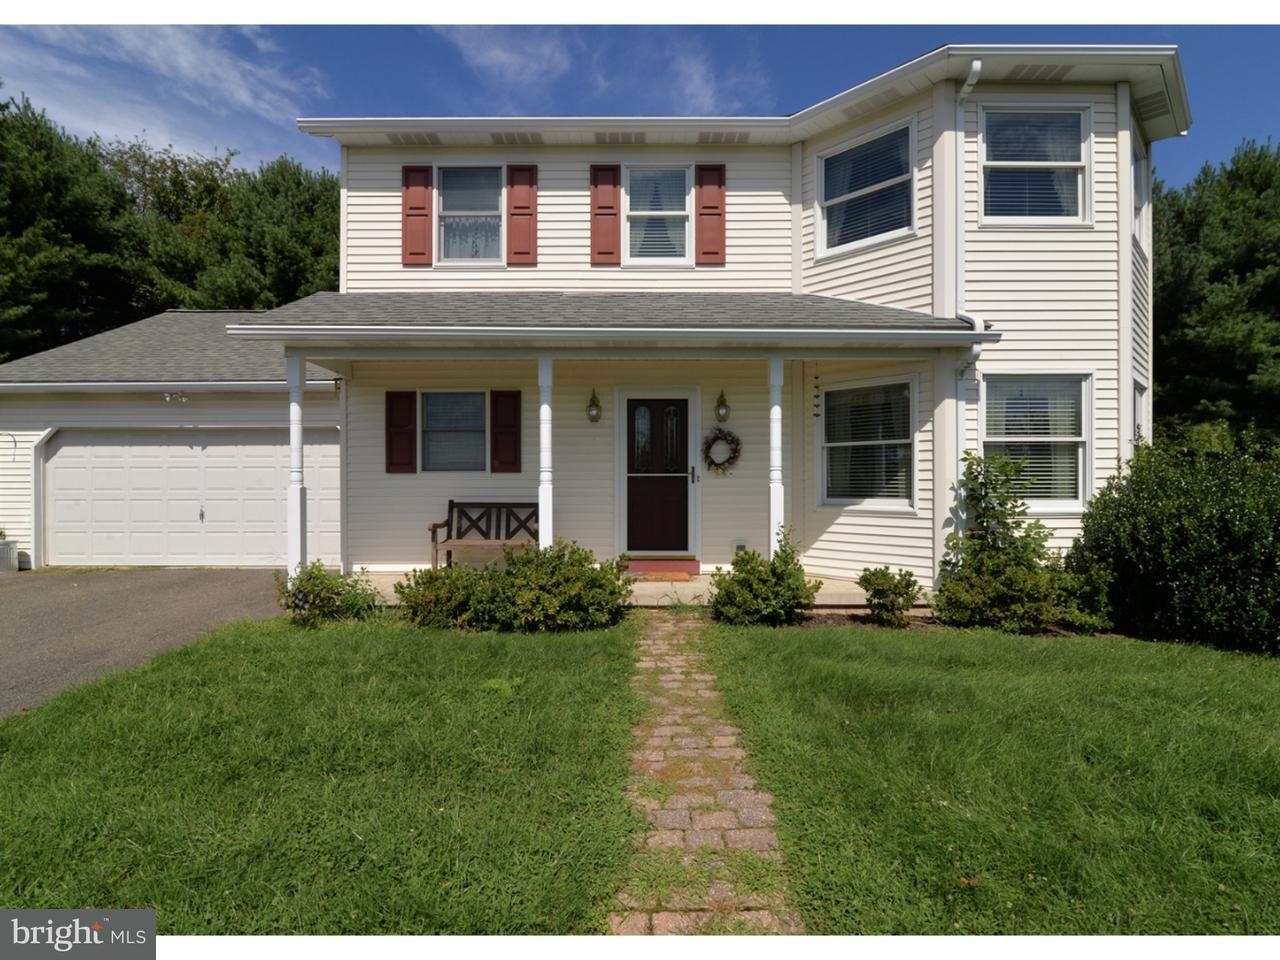 Single Family Home for Sale at 2005 EVERGREEN Drive Tamaqua, Pennsylvania 18252 United States